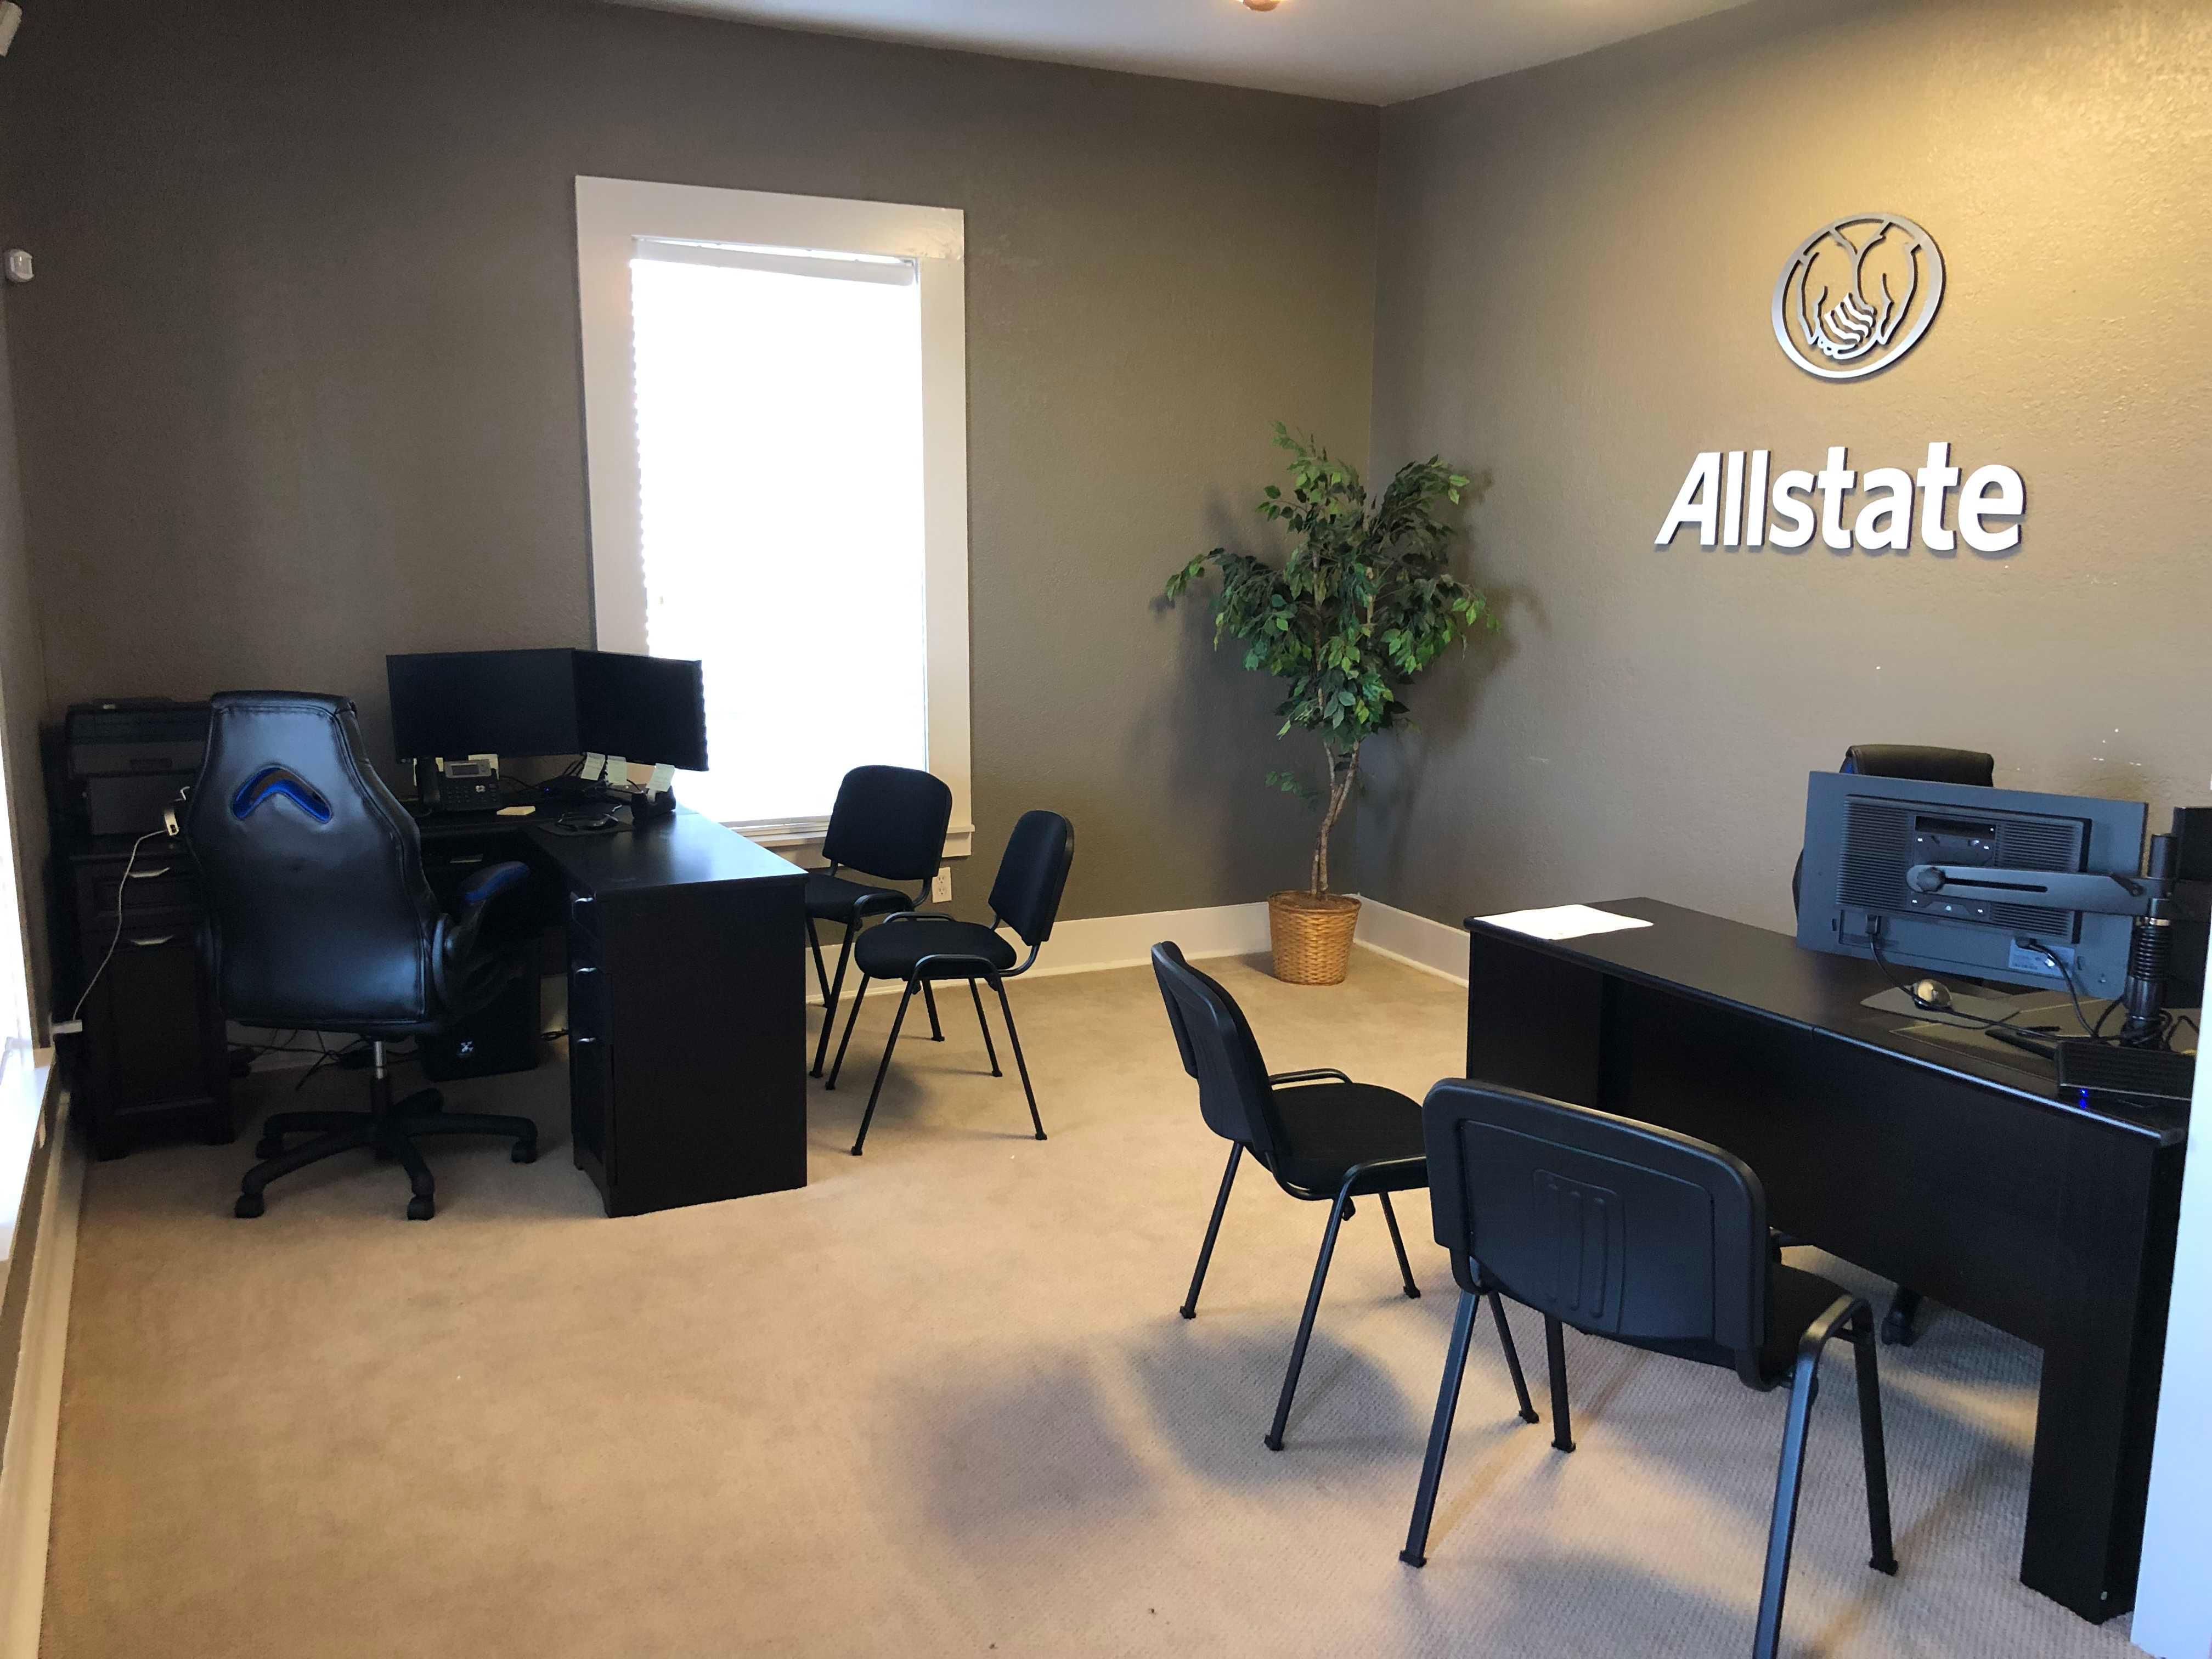 Allstate Insurance Agent: Cale Staton image 3